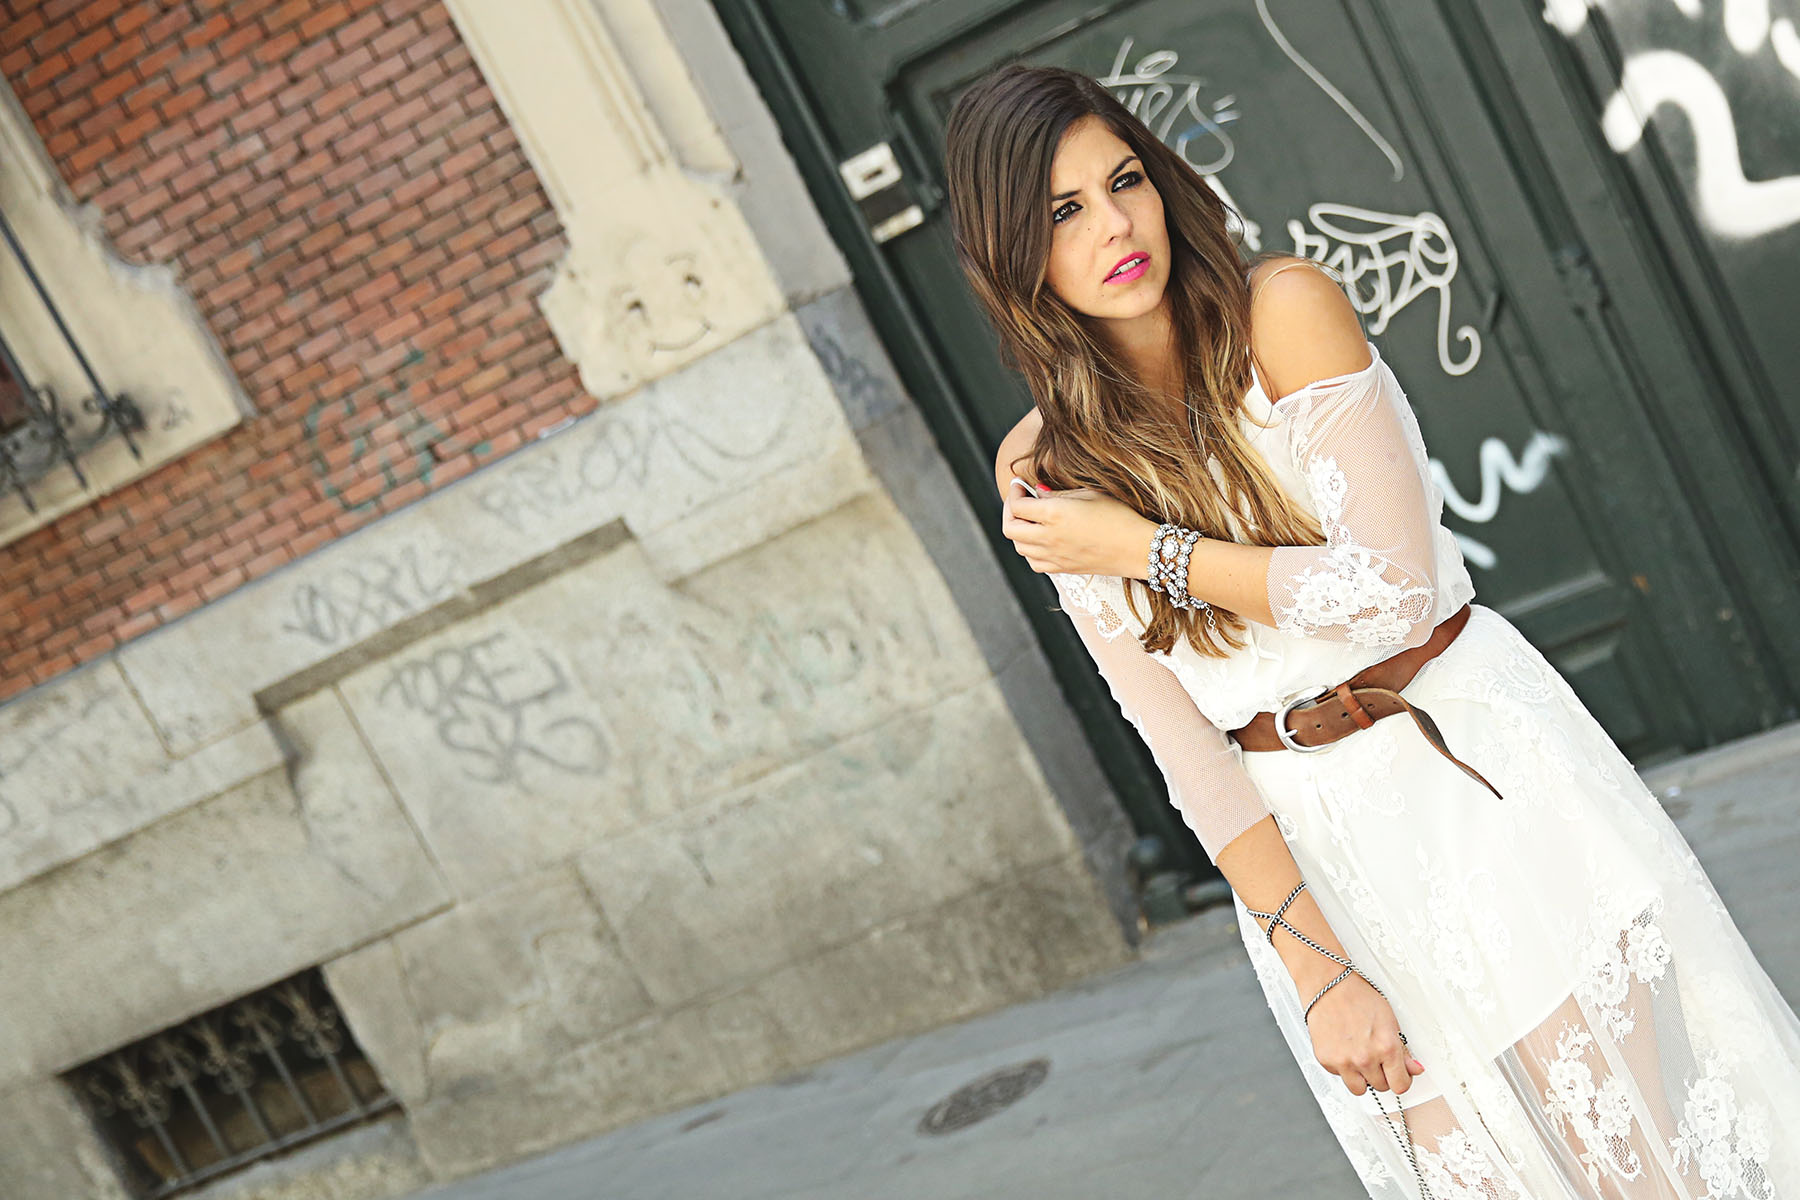 trendy-taste-look-outfit-street-style-ootd-blog-blogger-fashiopn-spain-moda-españa-magnum-juana-acosta-maje-9